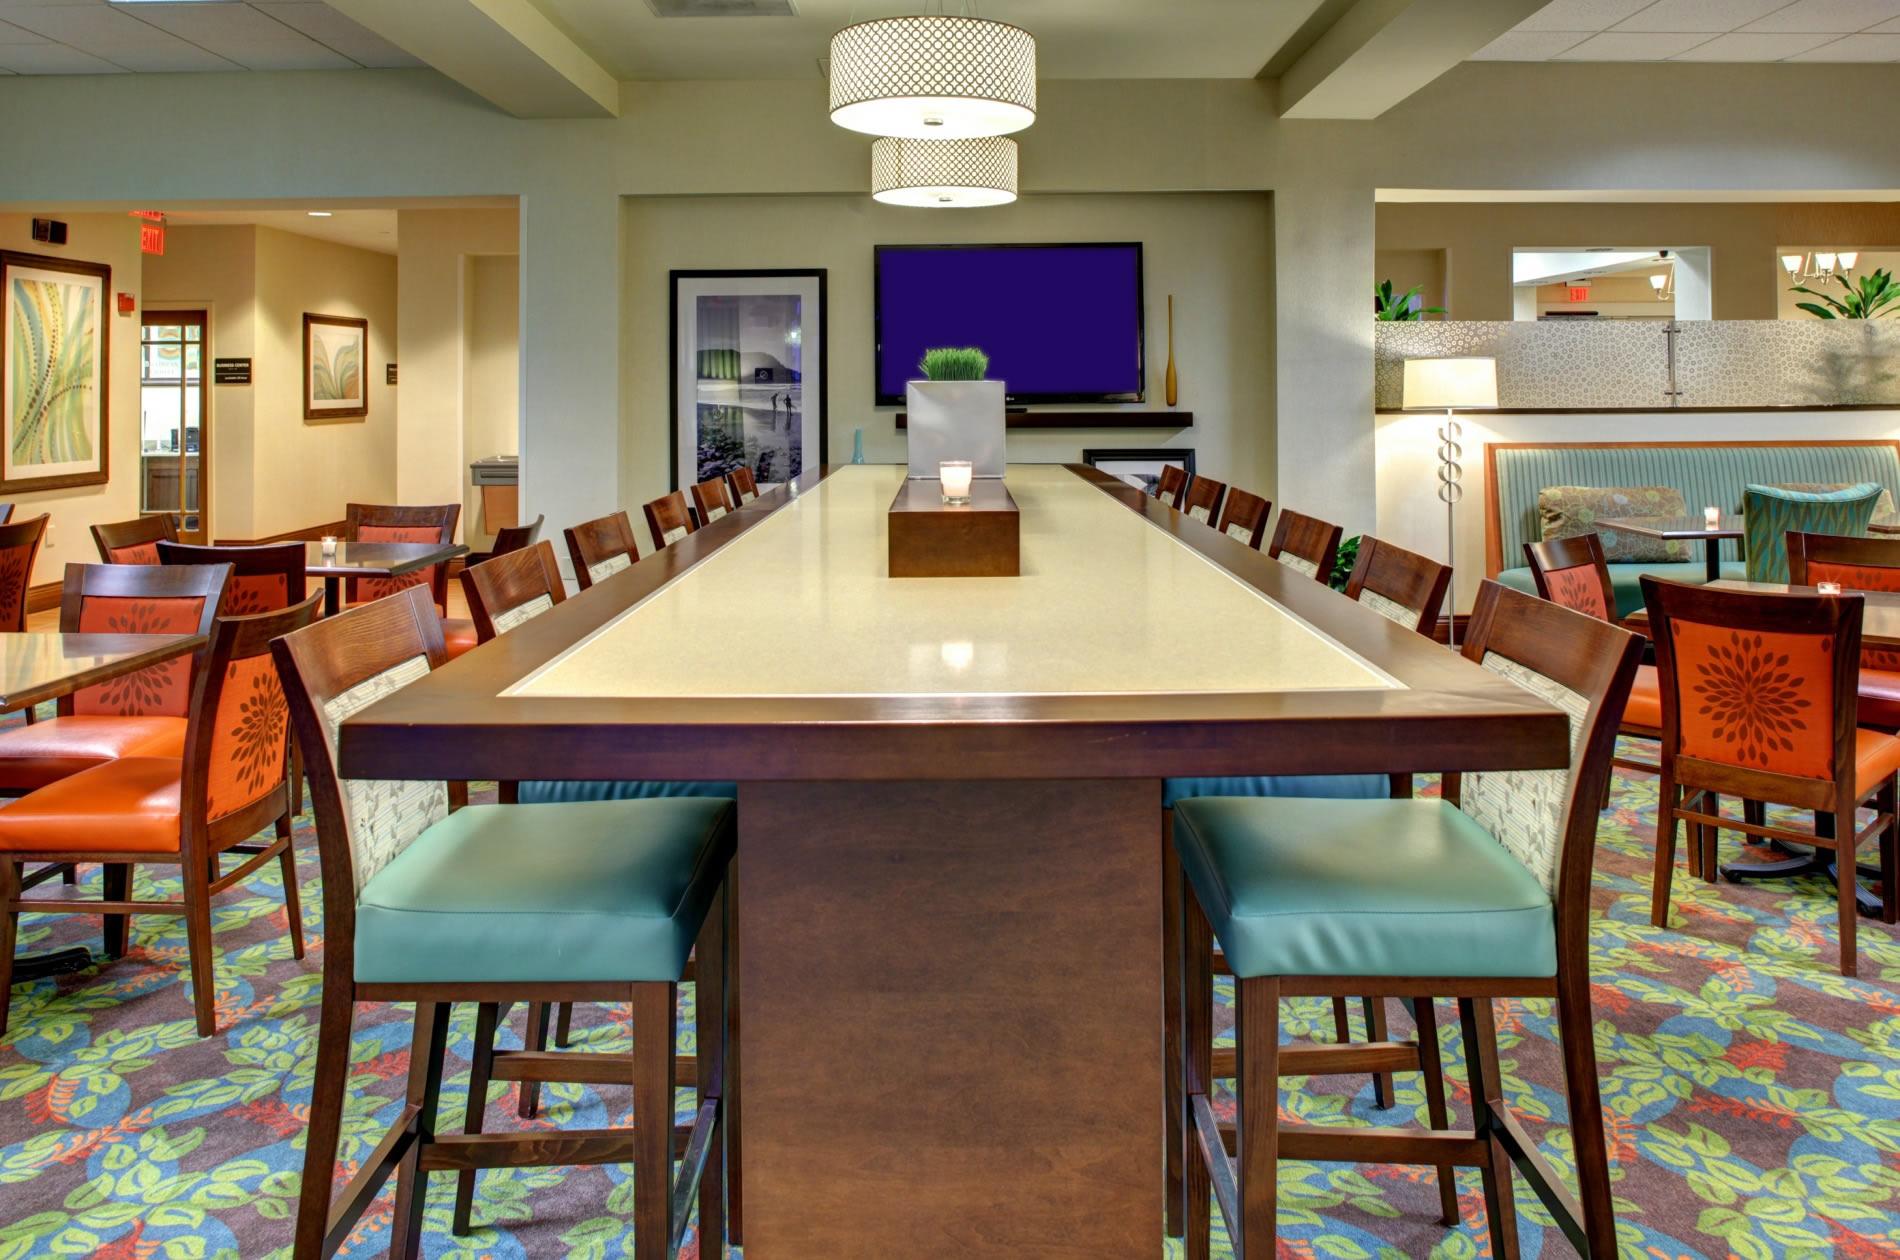 Hampton Inn by Hilton Pembroke Pines - Fort Lauderdale West image 4